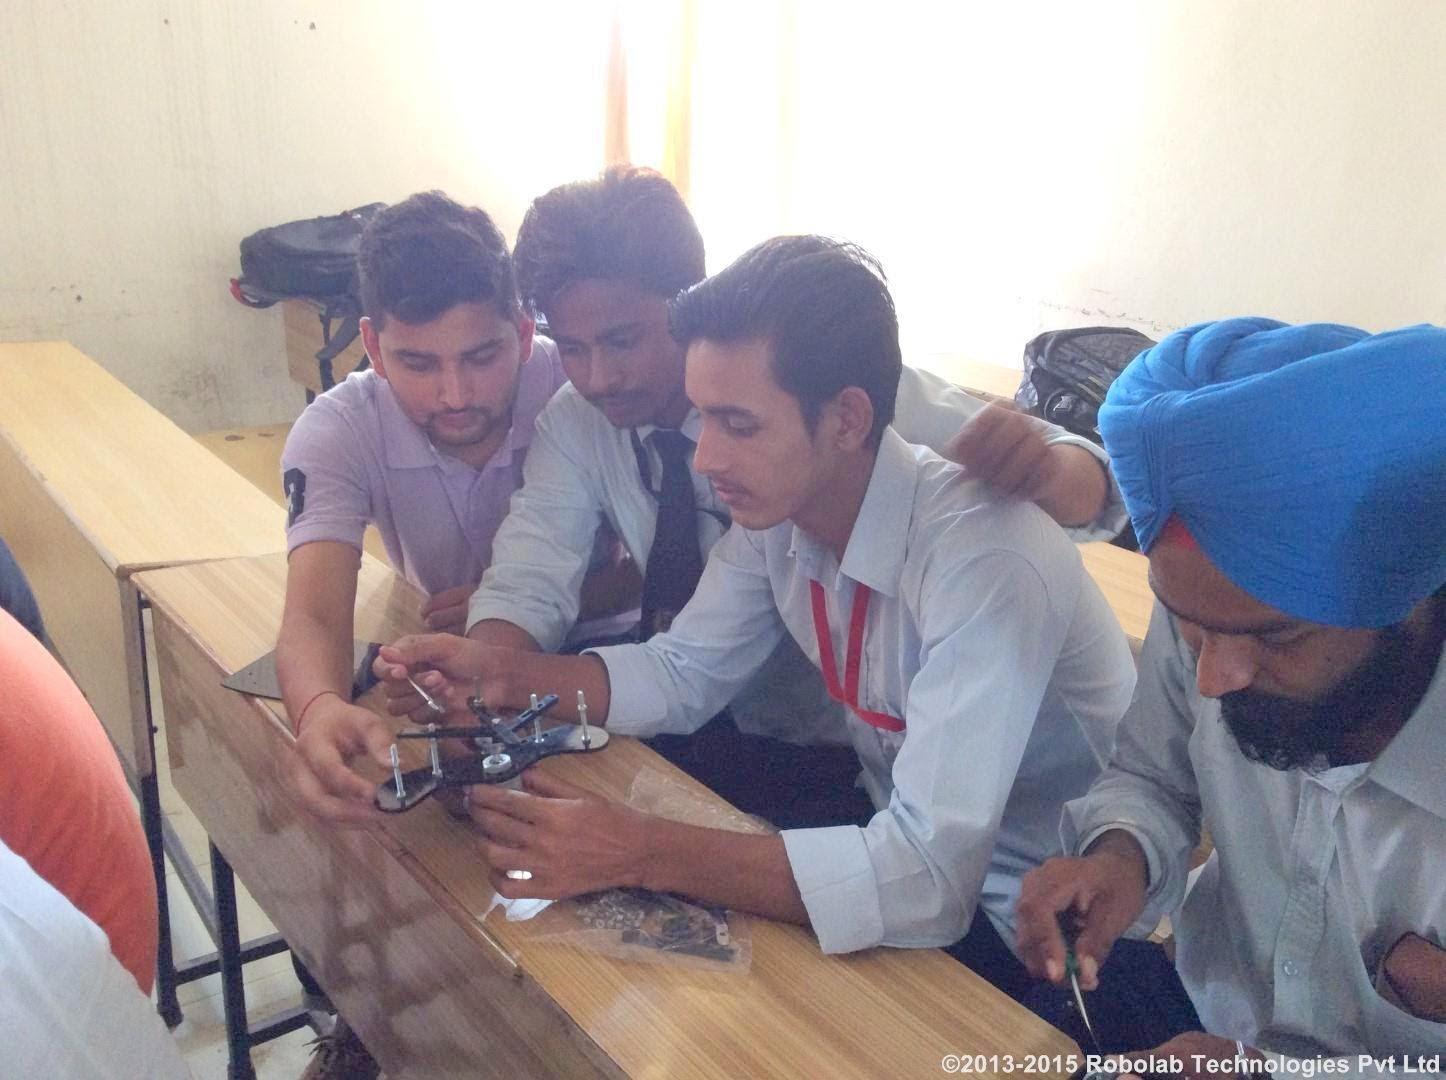 Amritsar College Of Engineering and Technology, Amritsar Robolab 15 (20).jpg